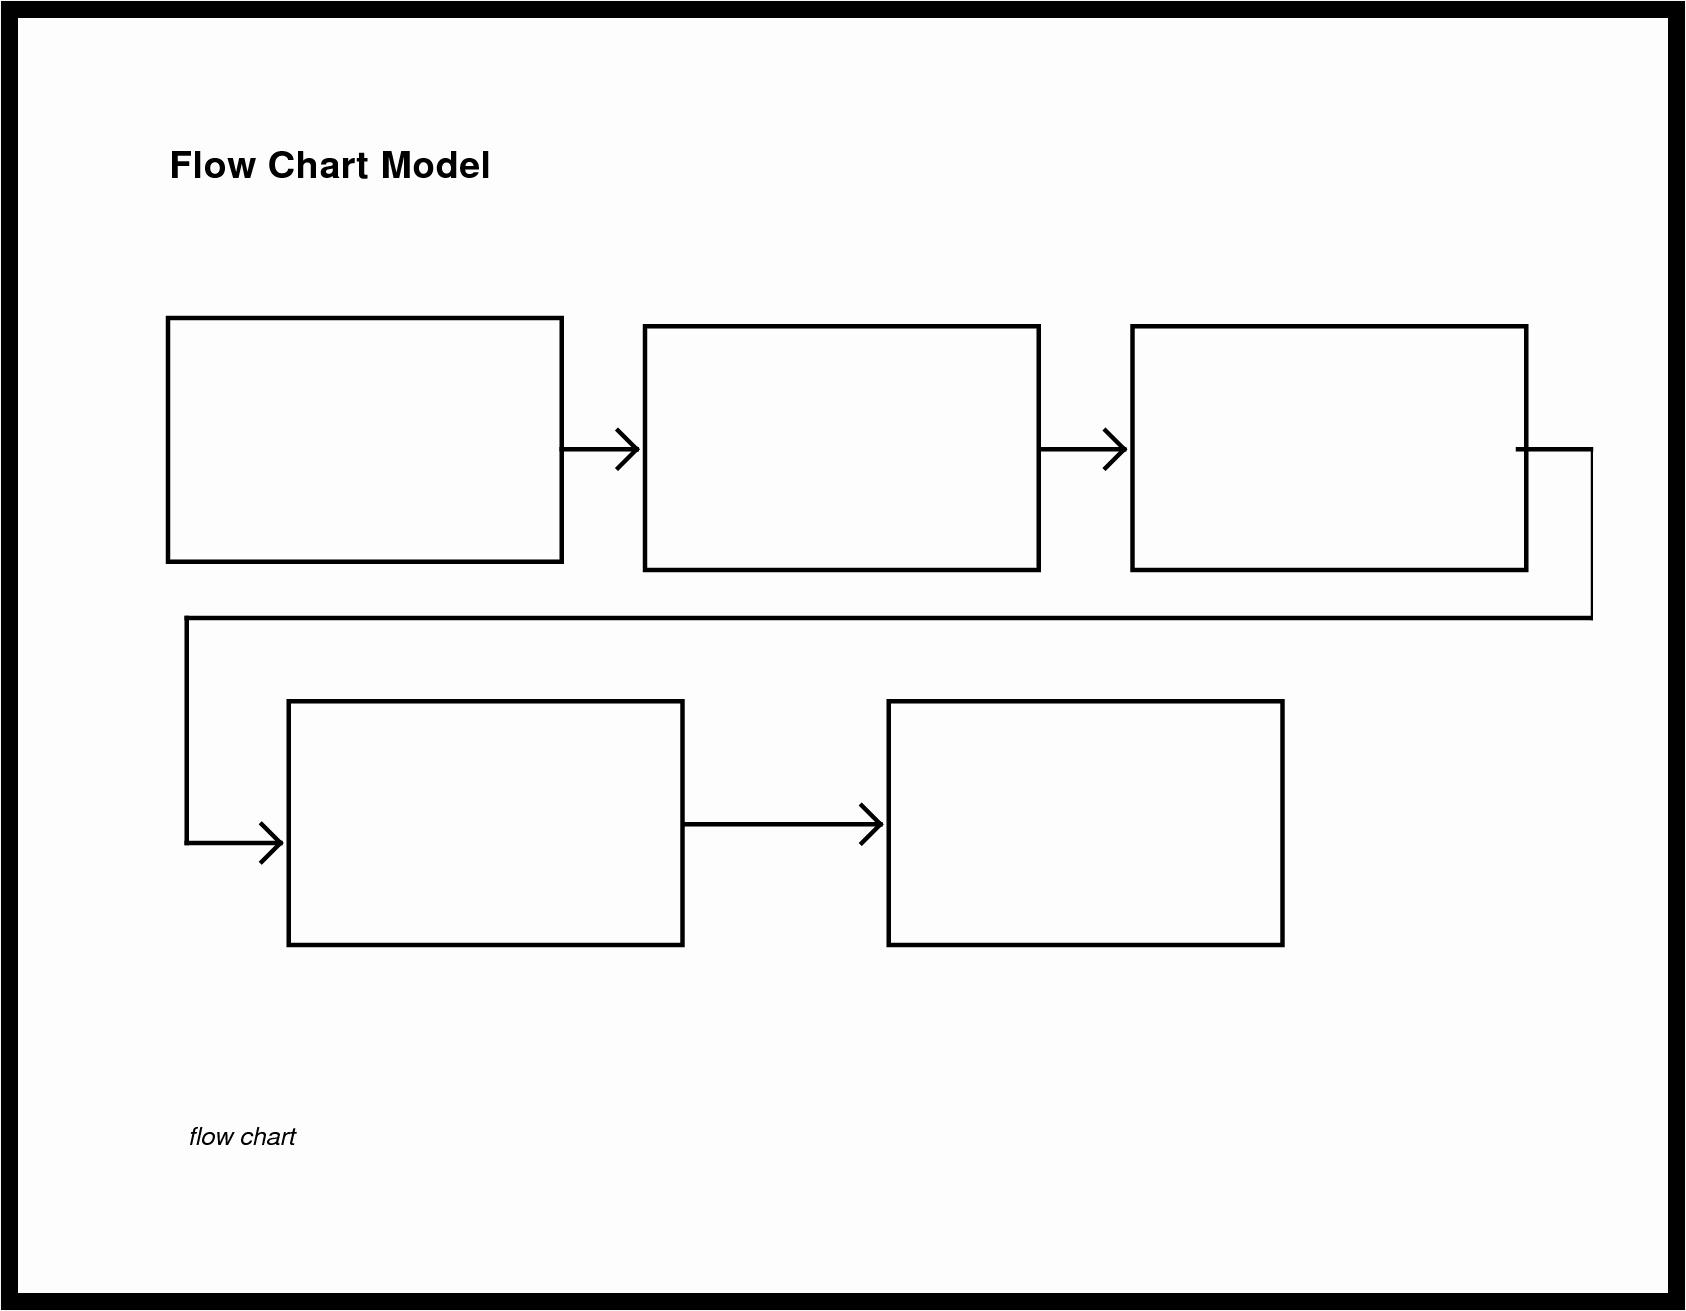 Blank Flowchart Template Lovely Flow Chart Template for Kids Shopgrat Basic Sample